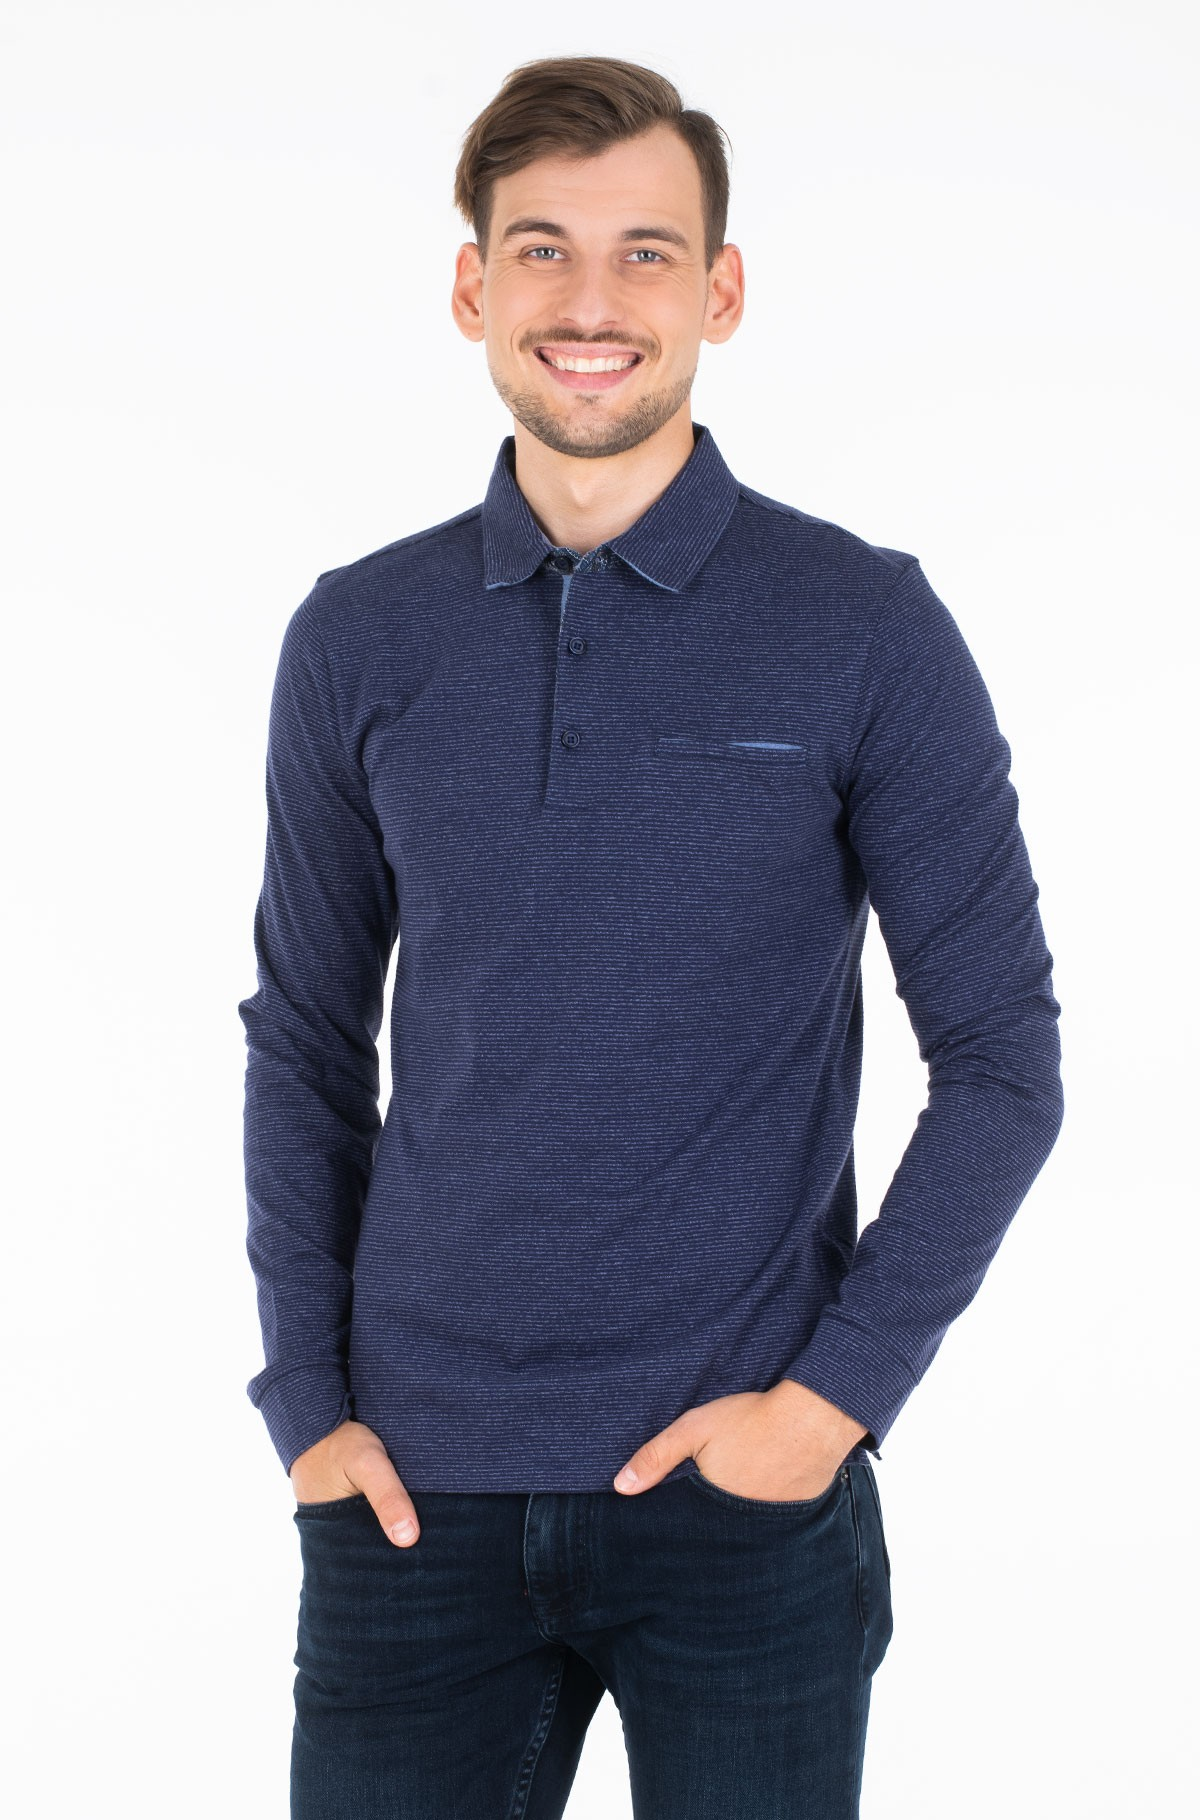 Polo marškinėliai ilgomis rankovėmis 53434-92307-full-1